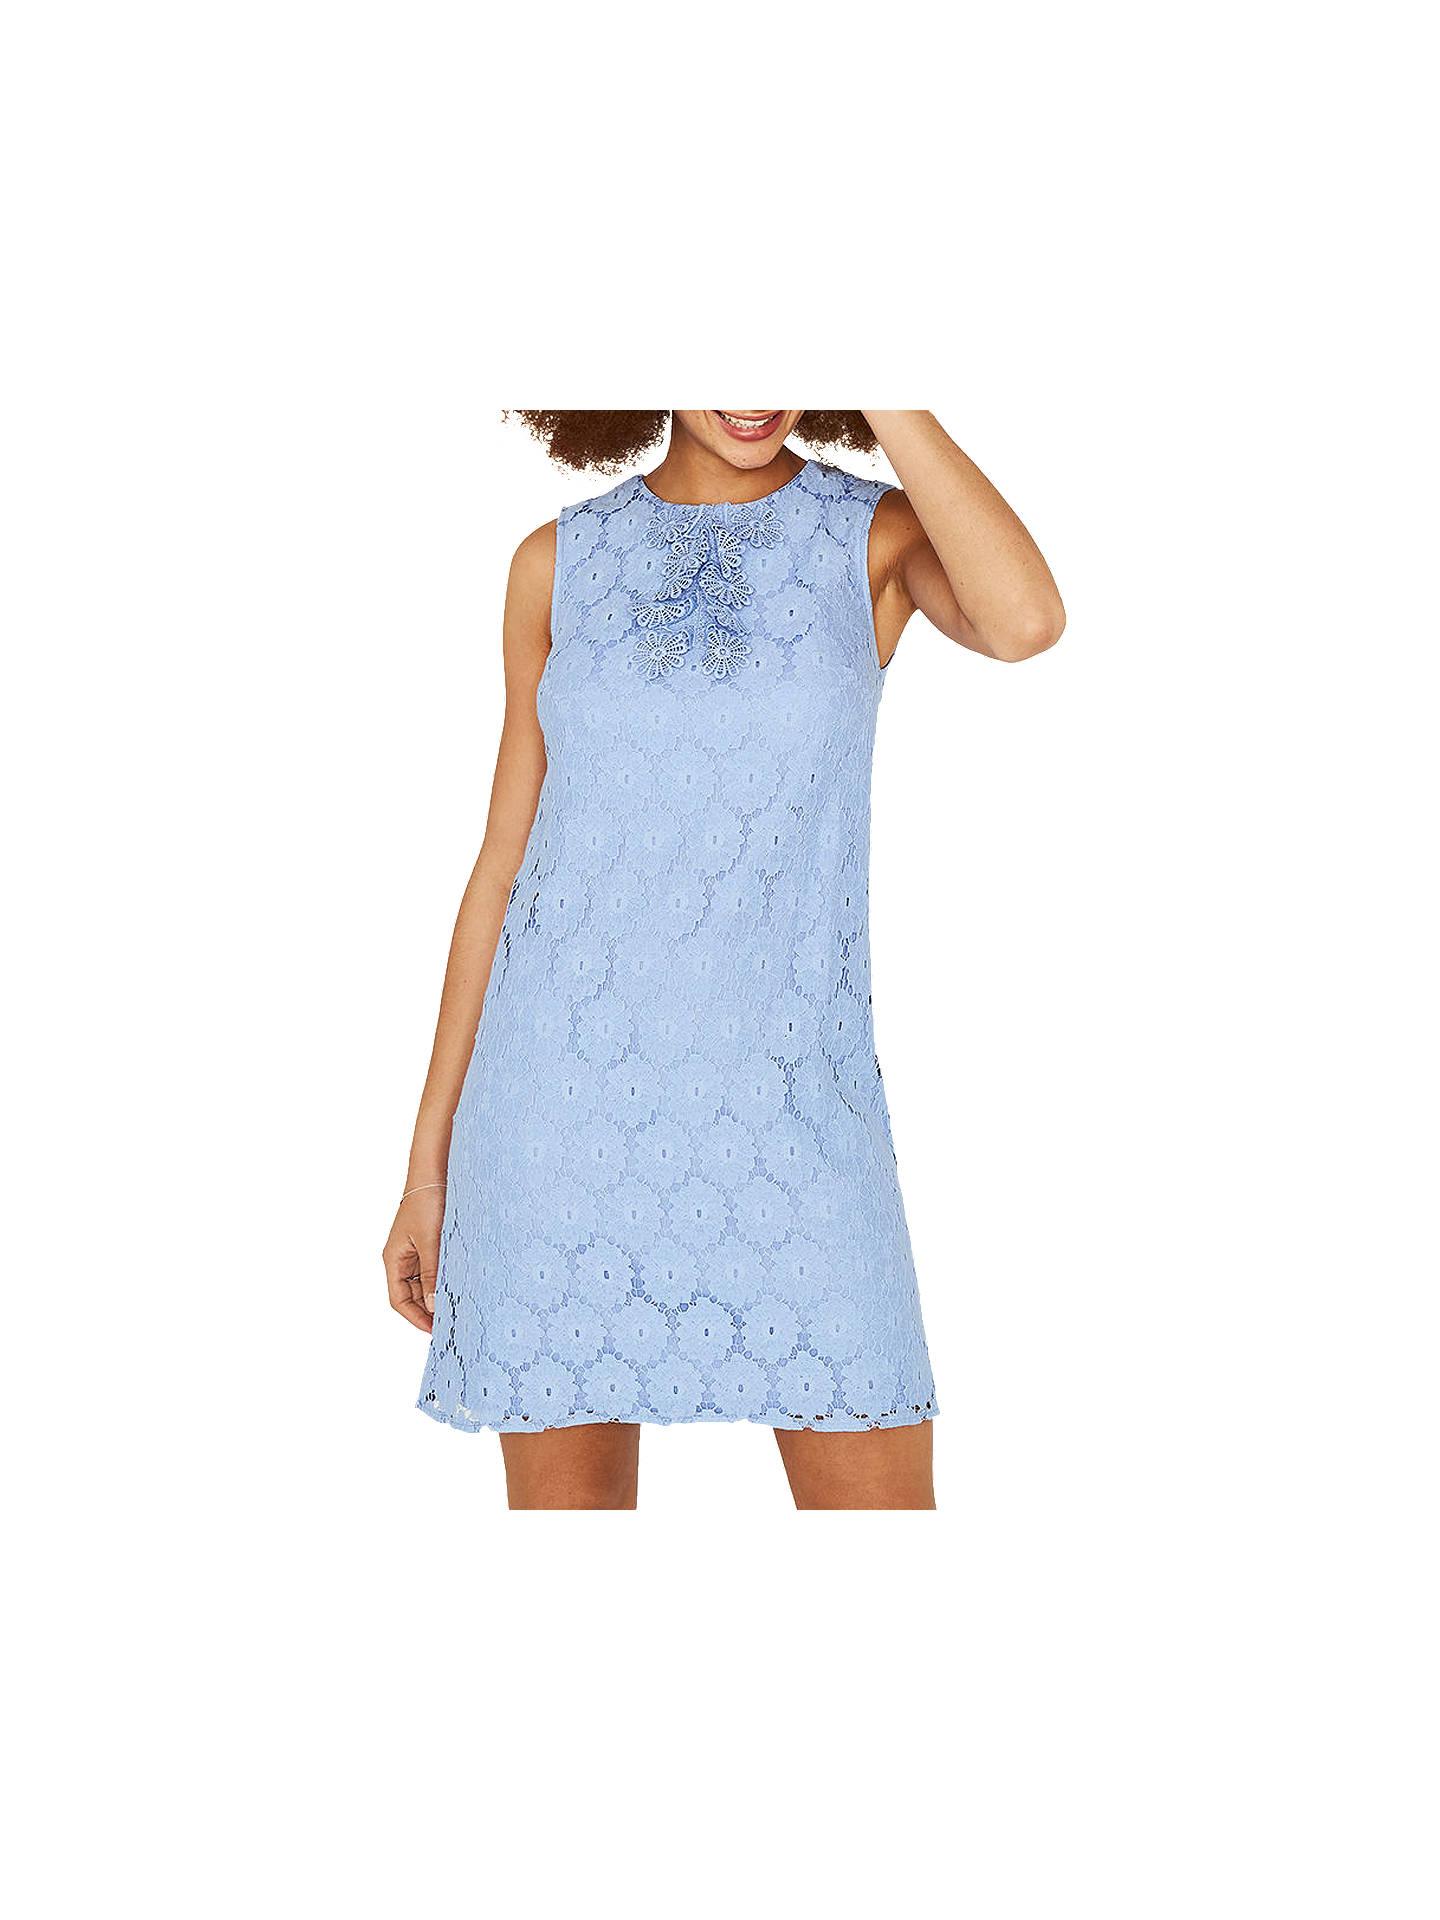 79da5c77cda3 Buy Oasis Daisy Lace Dress, Light Blue, XS Online at johnlewis.com ...